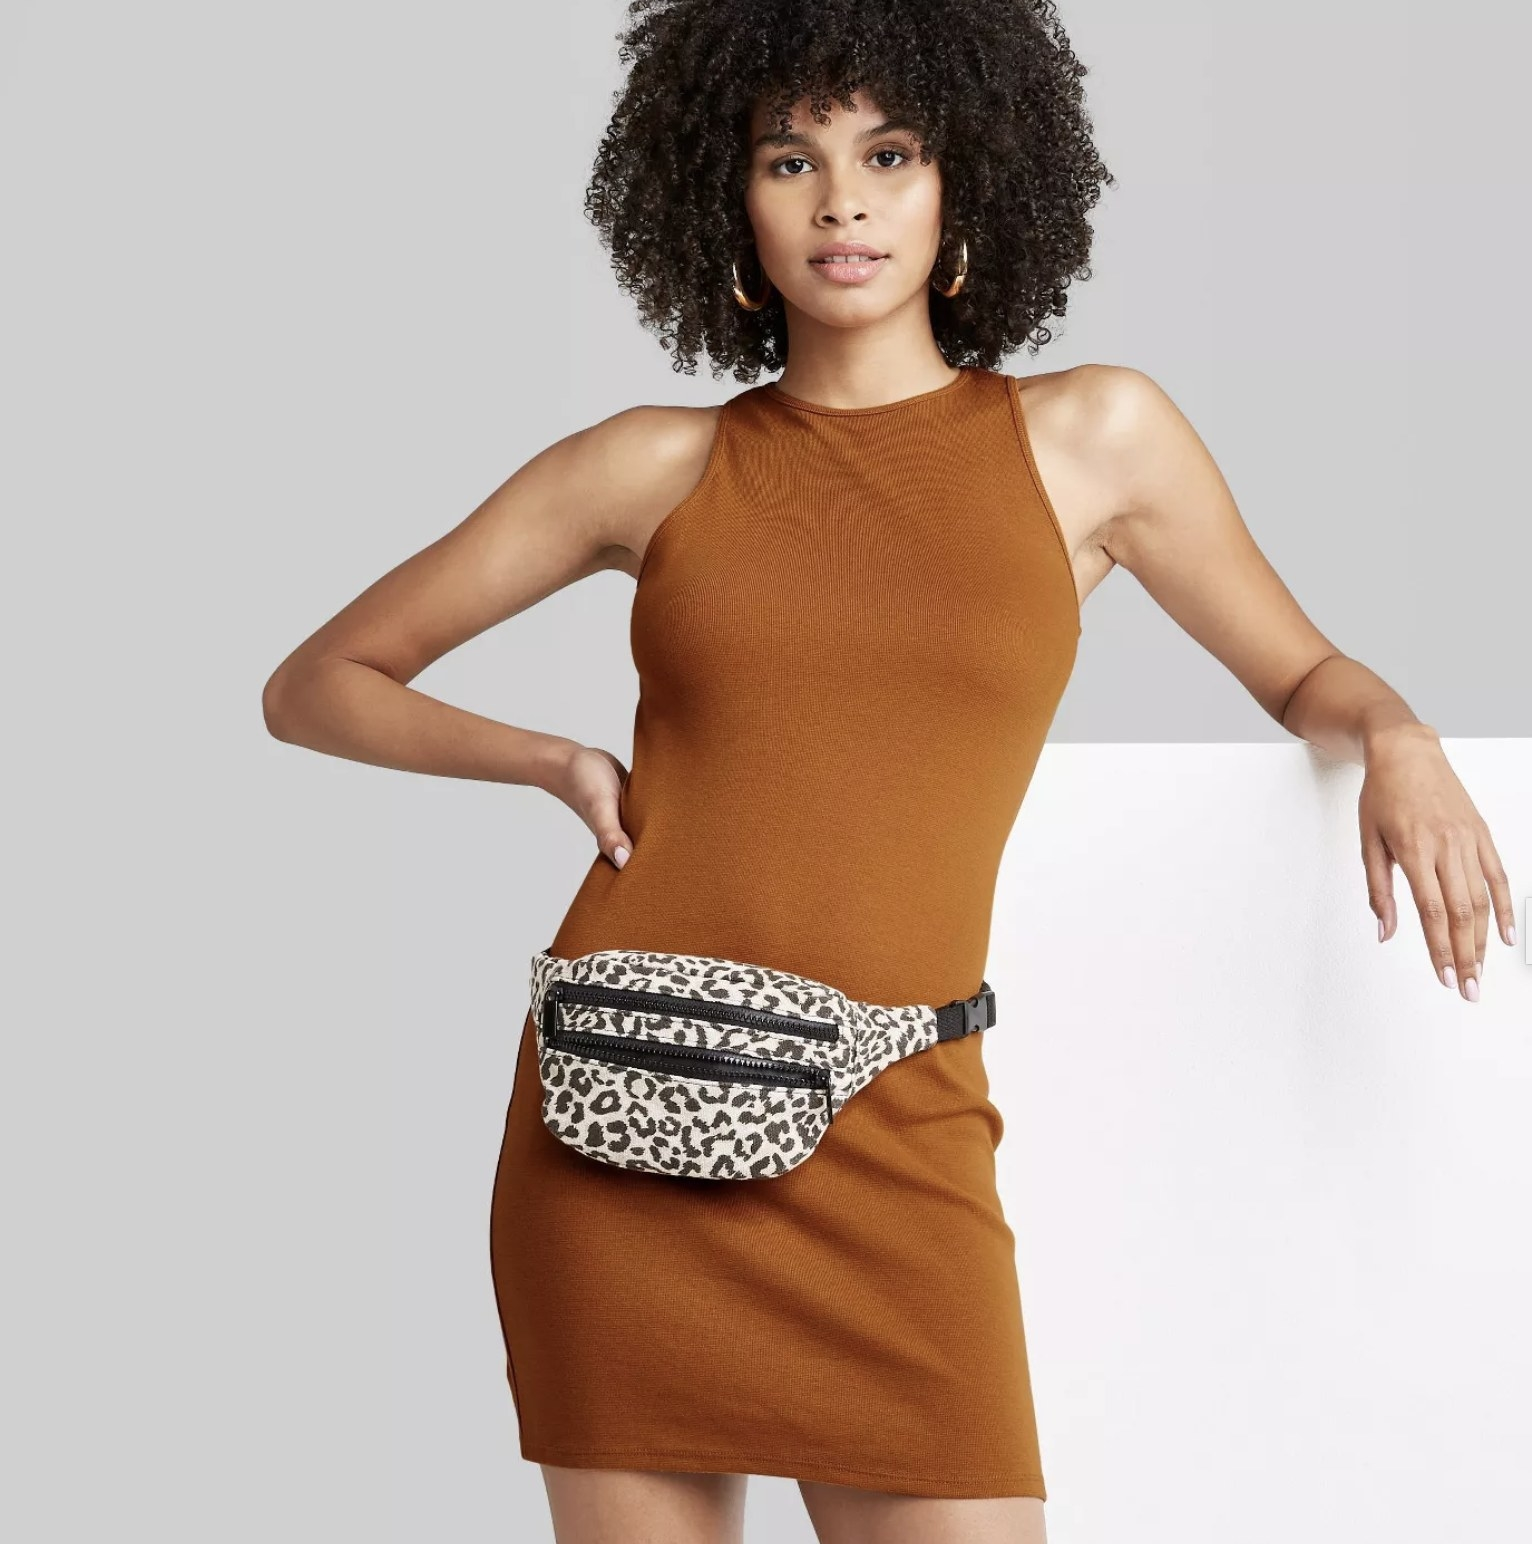 model wearing dark orange mini dress